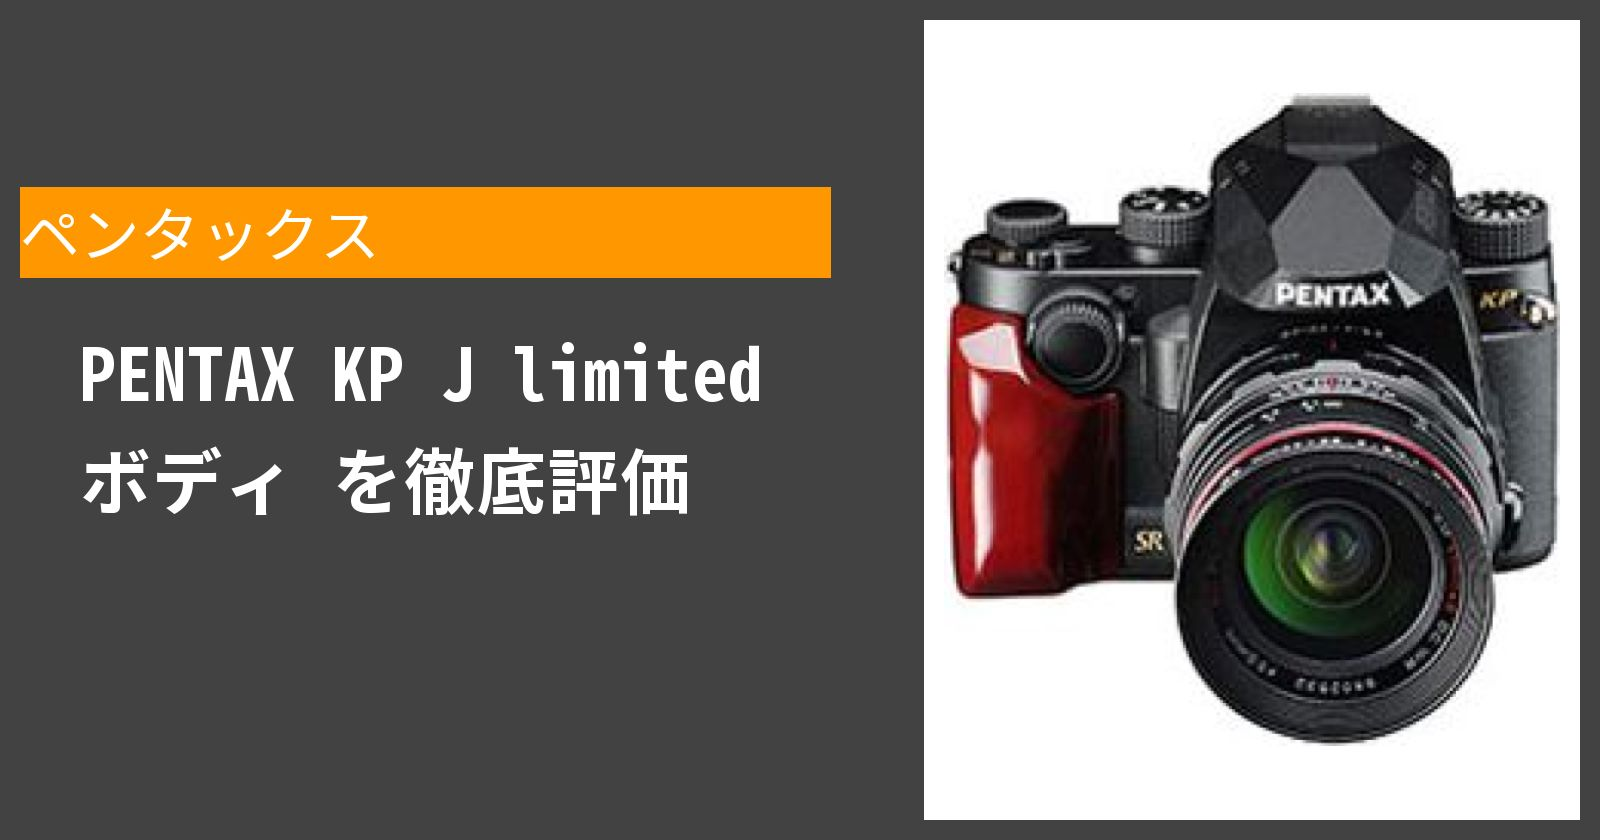 Kp j limited